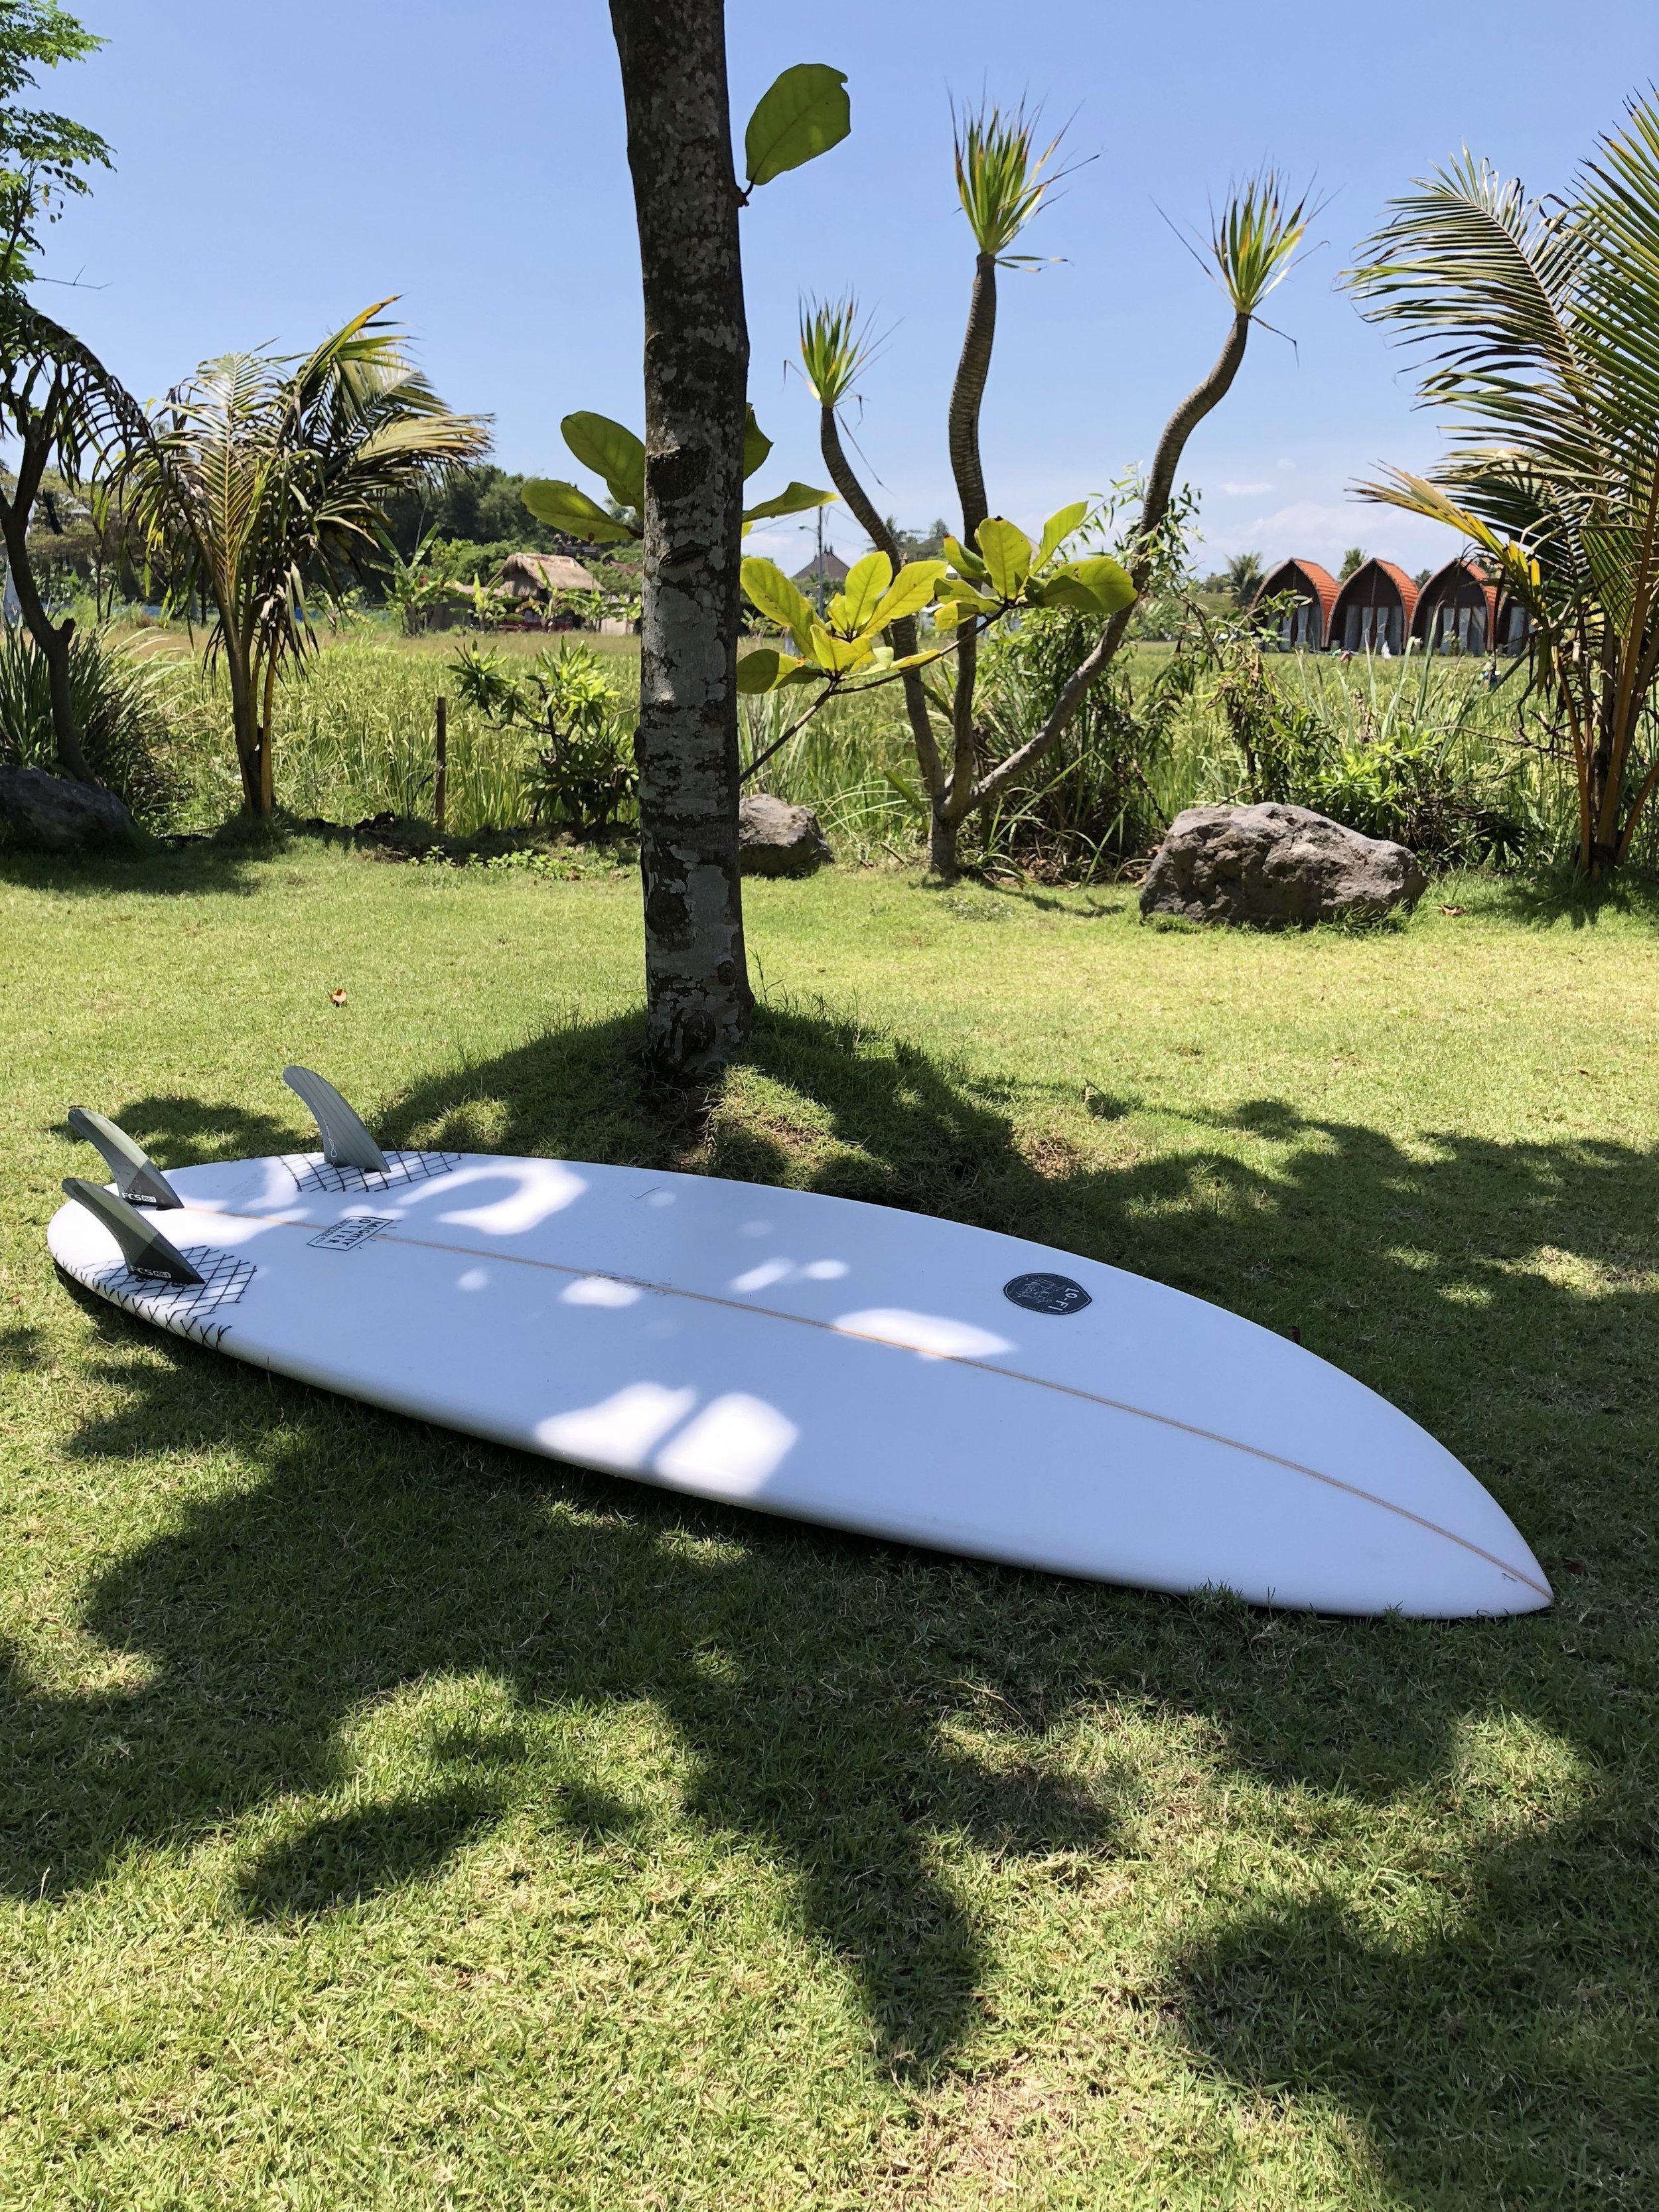 Mighty Otter Surfboards Lo Fi Indo Bali Lotta SurfsIMG_9640.JPG